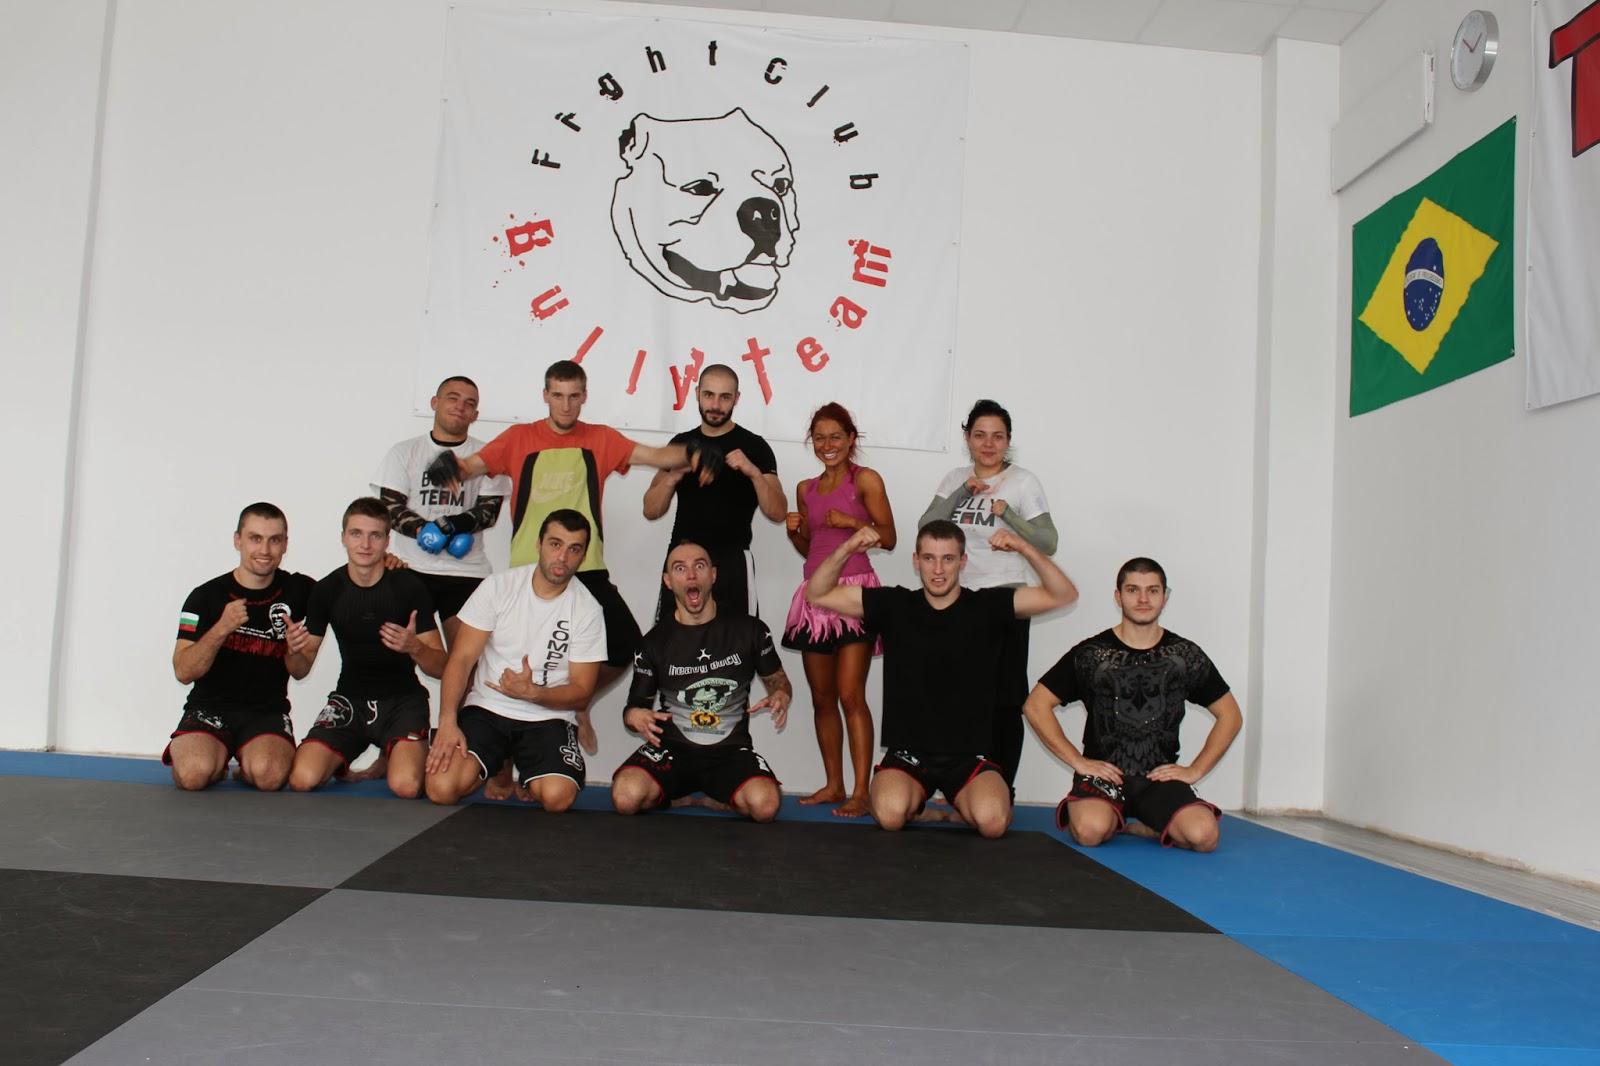 d0b461433f5 29.09.2013 MMA Stricking seminar with Dragan Pesic. Sofia, Bulgaria.